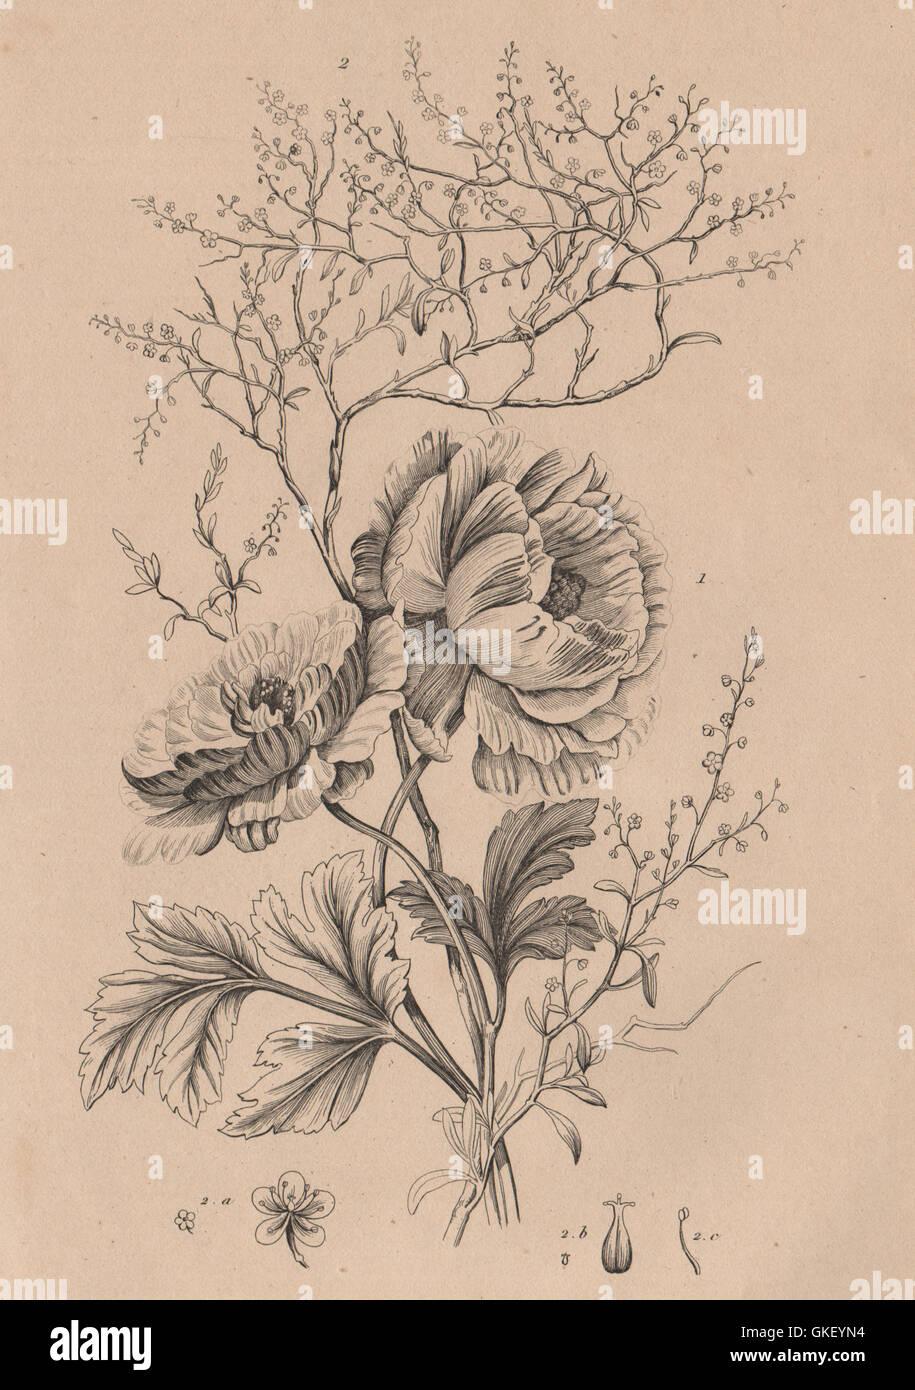 FLOWERS: Ranunculus. Renouée (Knotweed), antique print 1834 - Stock Image